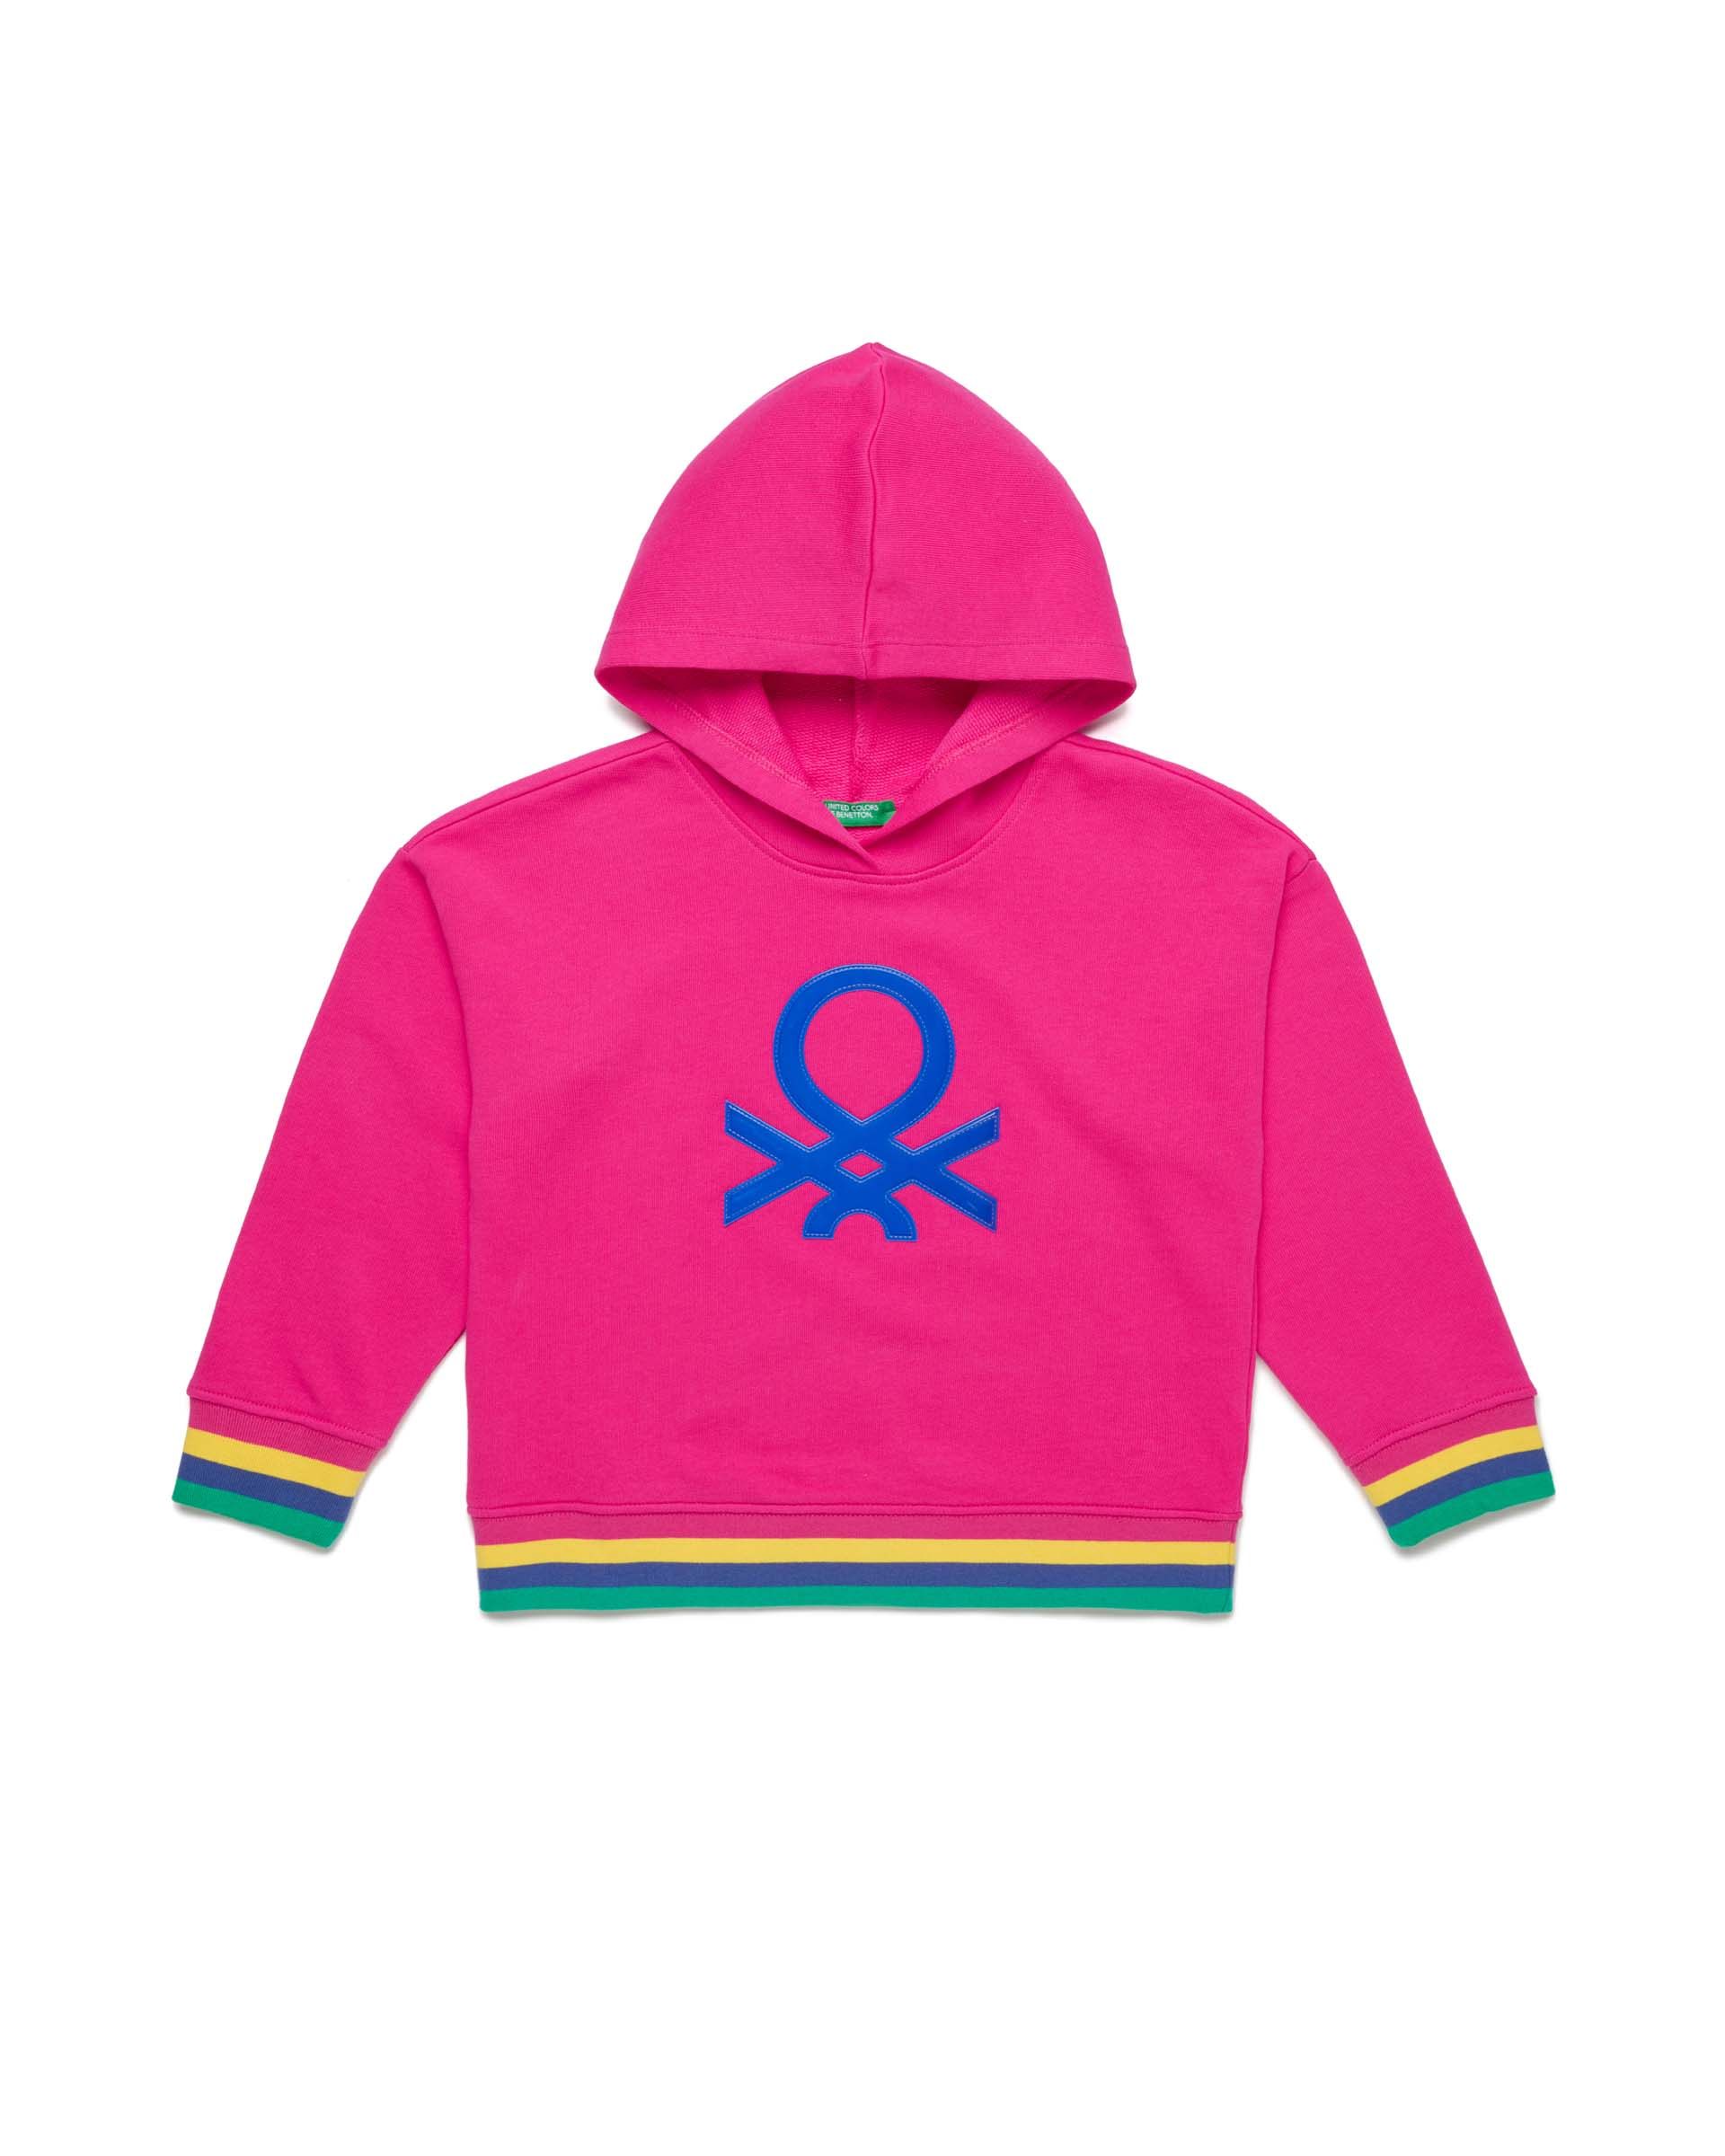 Купить 20P_3J68C2175_2L3, Толстовка для девочек Benetton 3J68C2175_2L3 р-р 170, United Colors of Benetton, Толстовки для девочек